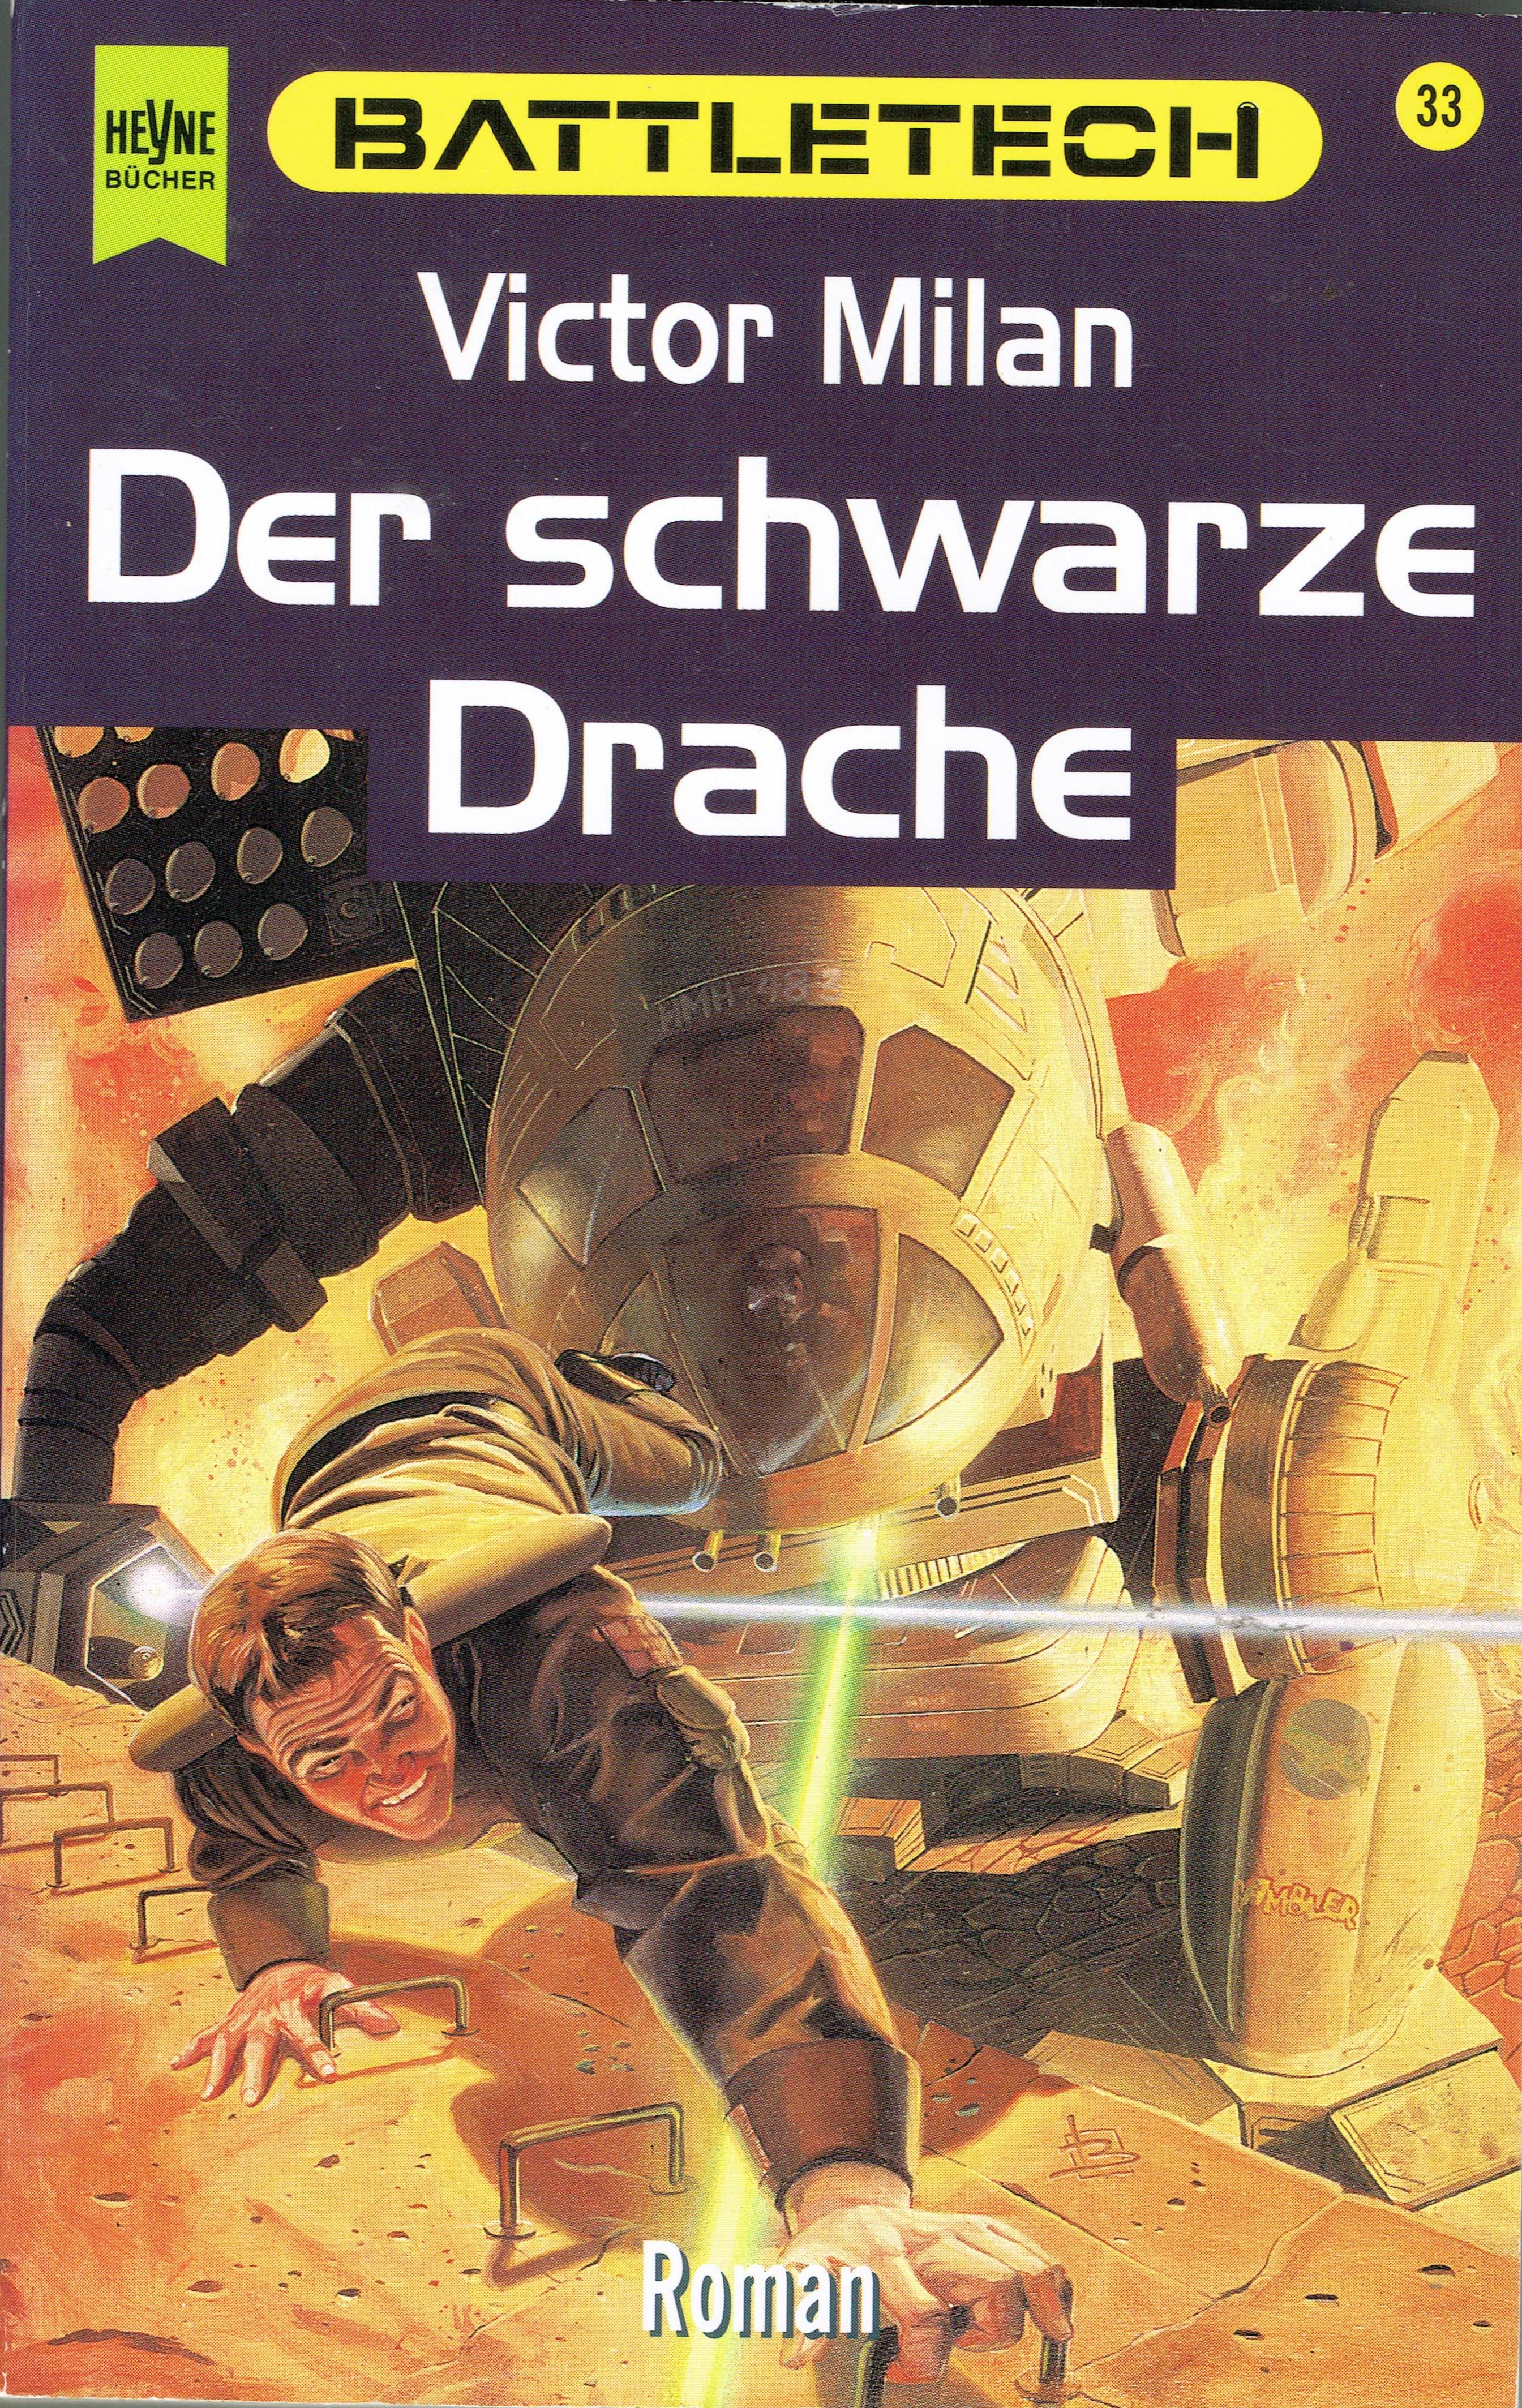 File:Der schwarze Drache.jpg